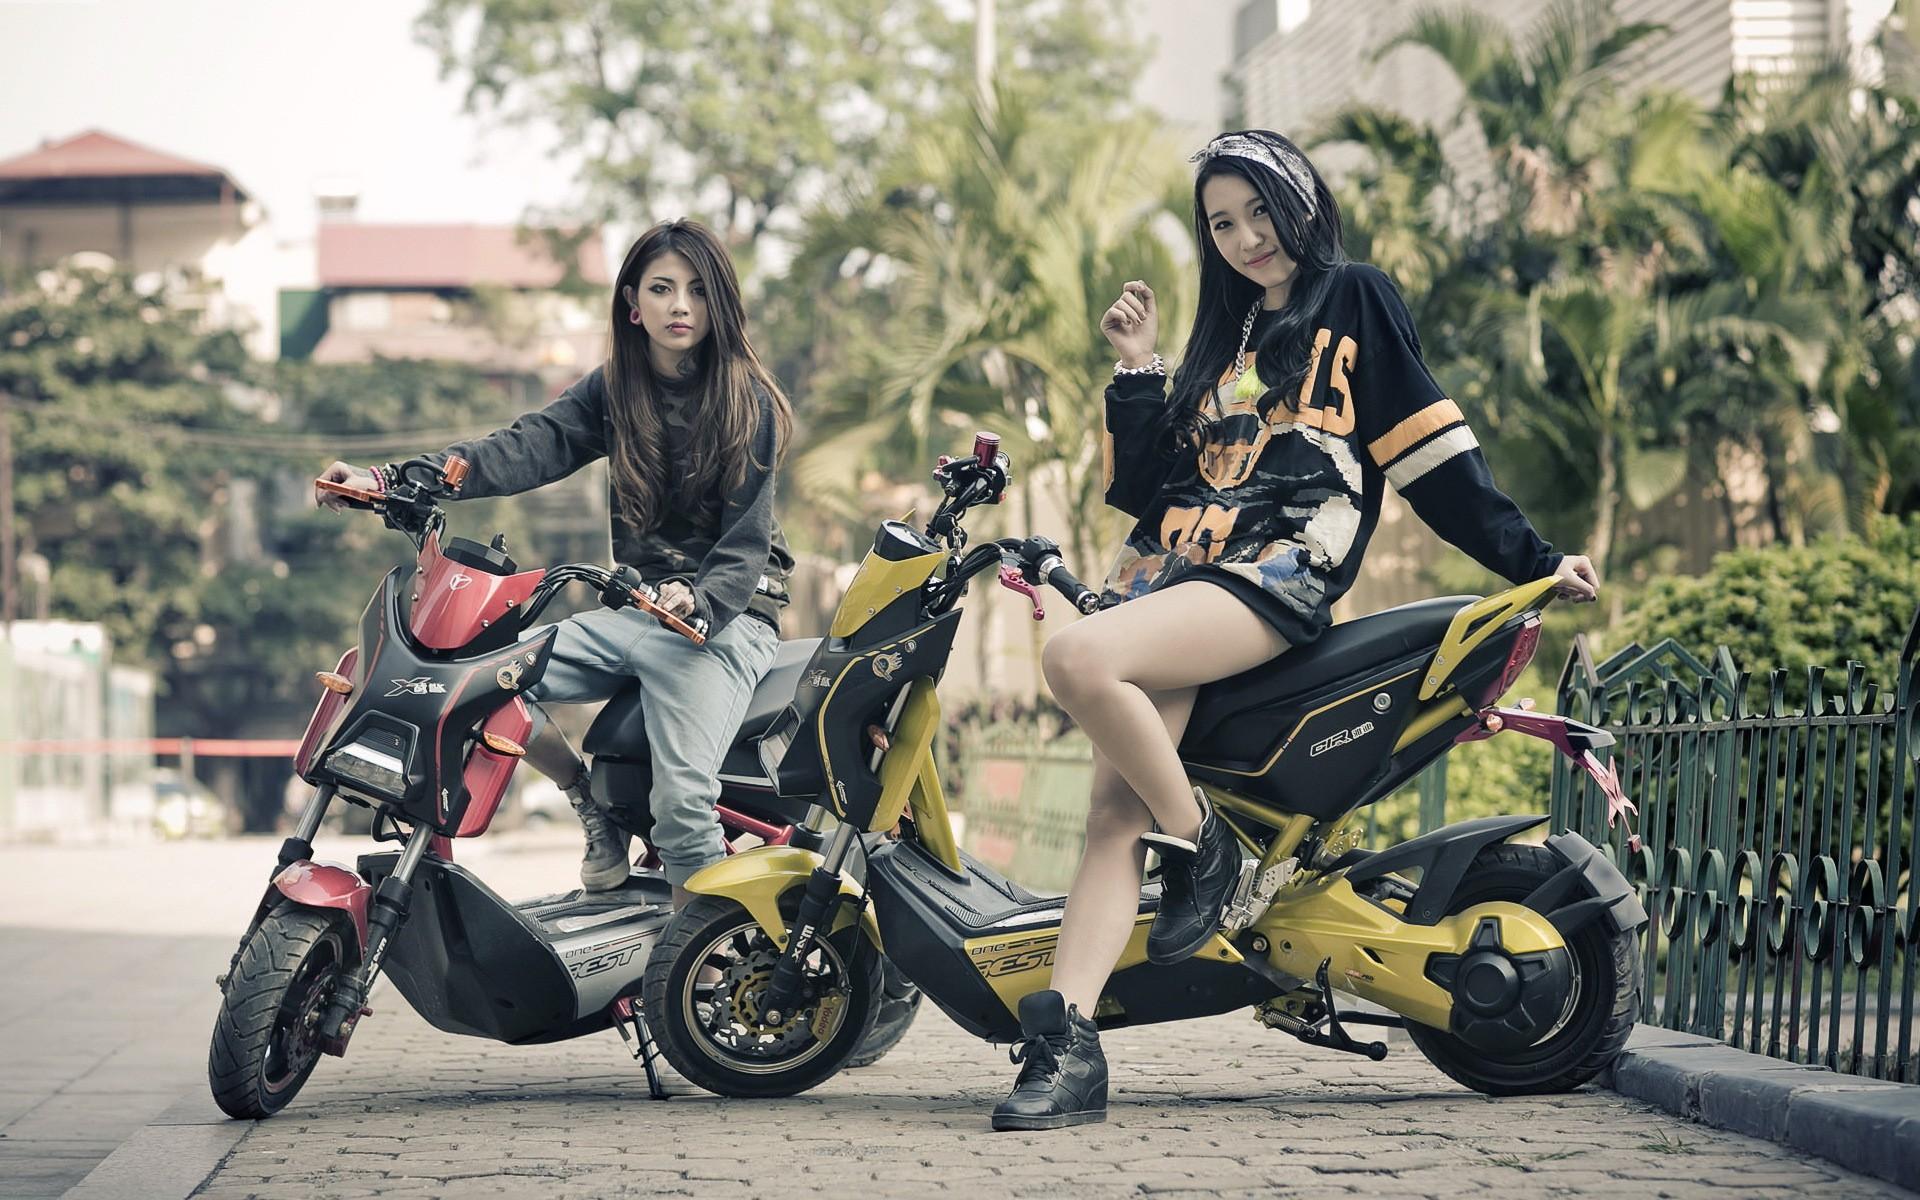 Motorcycle Girl Wallpaper - WallpaperSafari